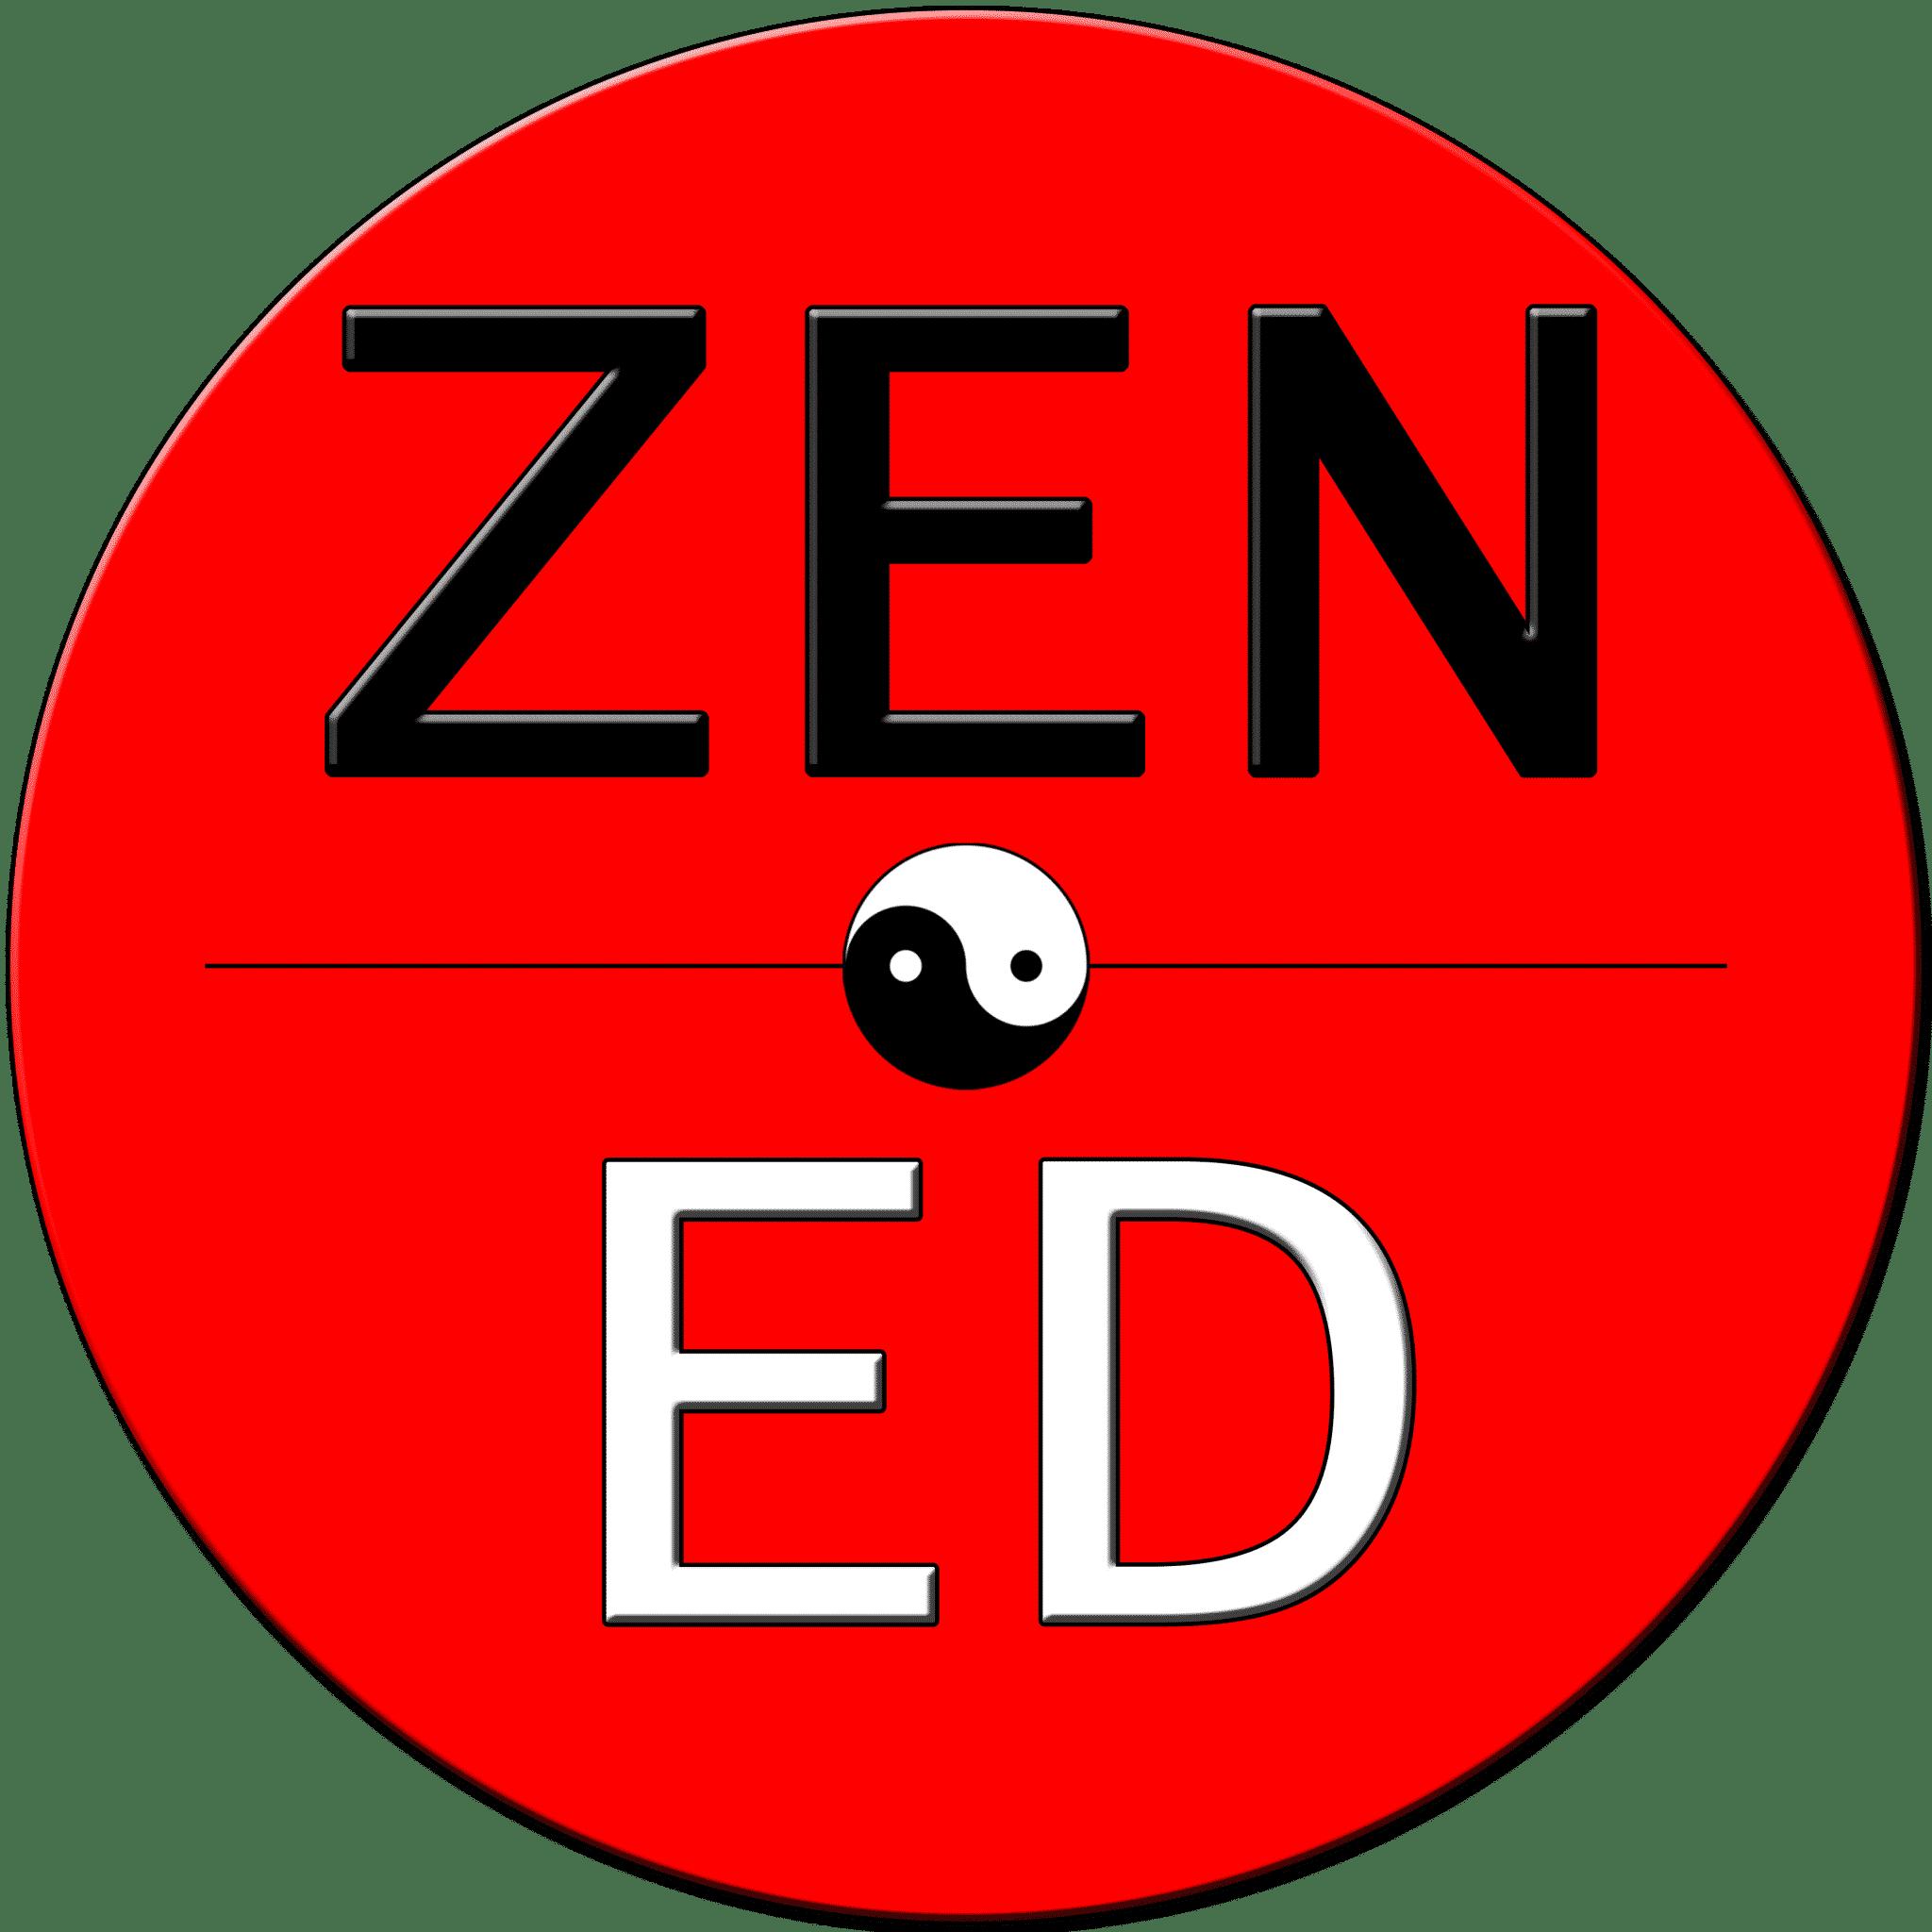 Zen Ed Academy, Logo, Zen Ed Academy Membership, Personal Development, Mediumship Training, Zen Rose Garden, Helping People Create BADASS Lives, Las Vegas, NV, David A Caren, Heather Kim Rodriguez